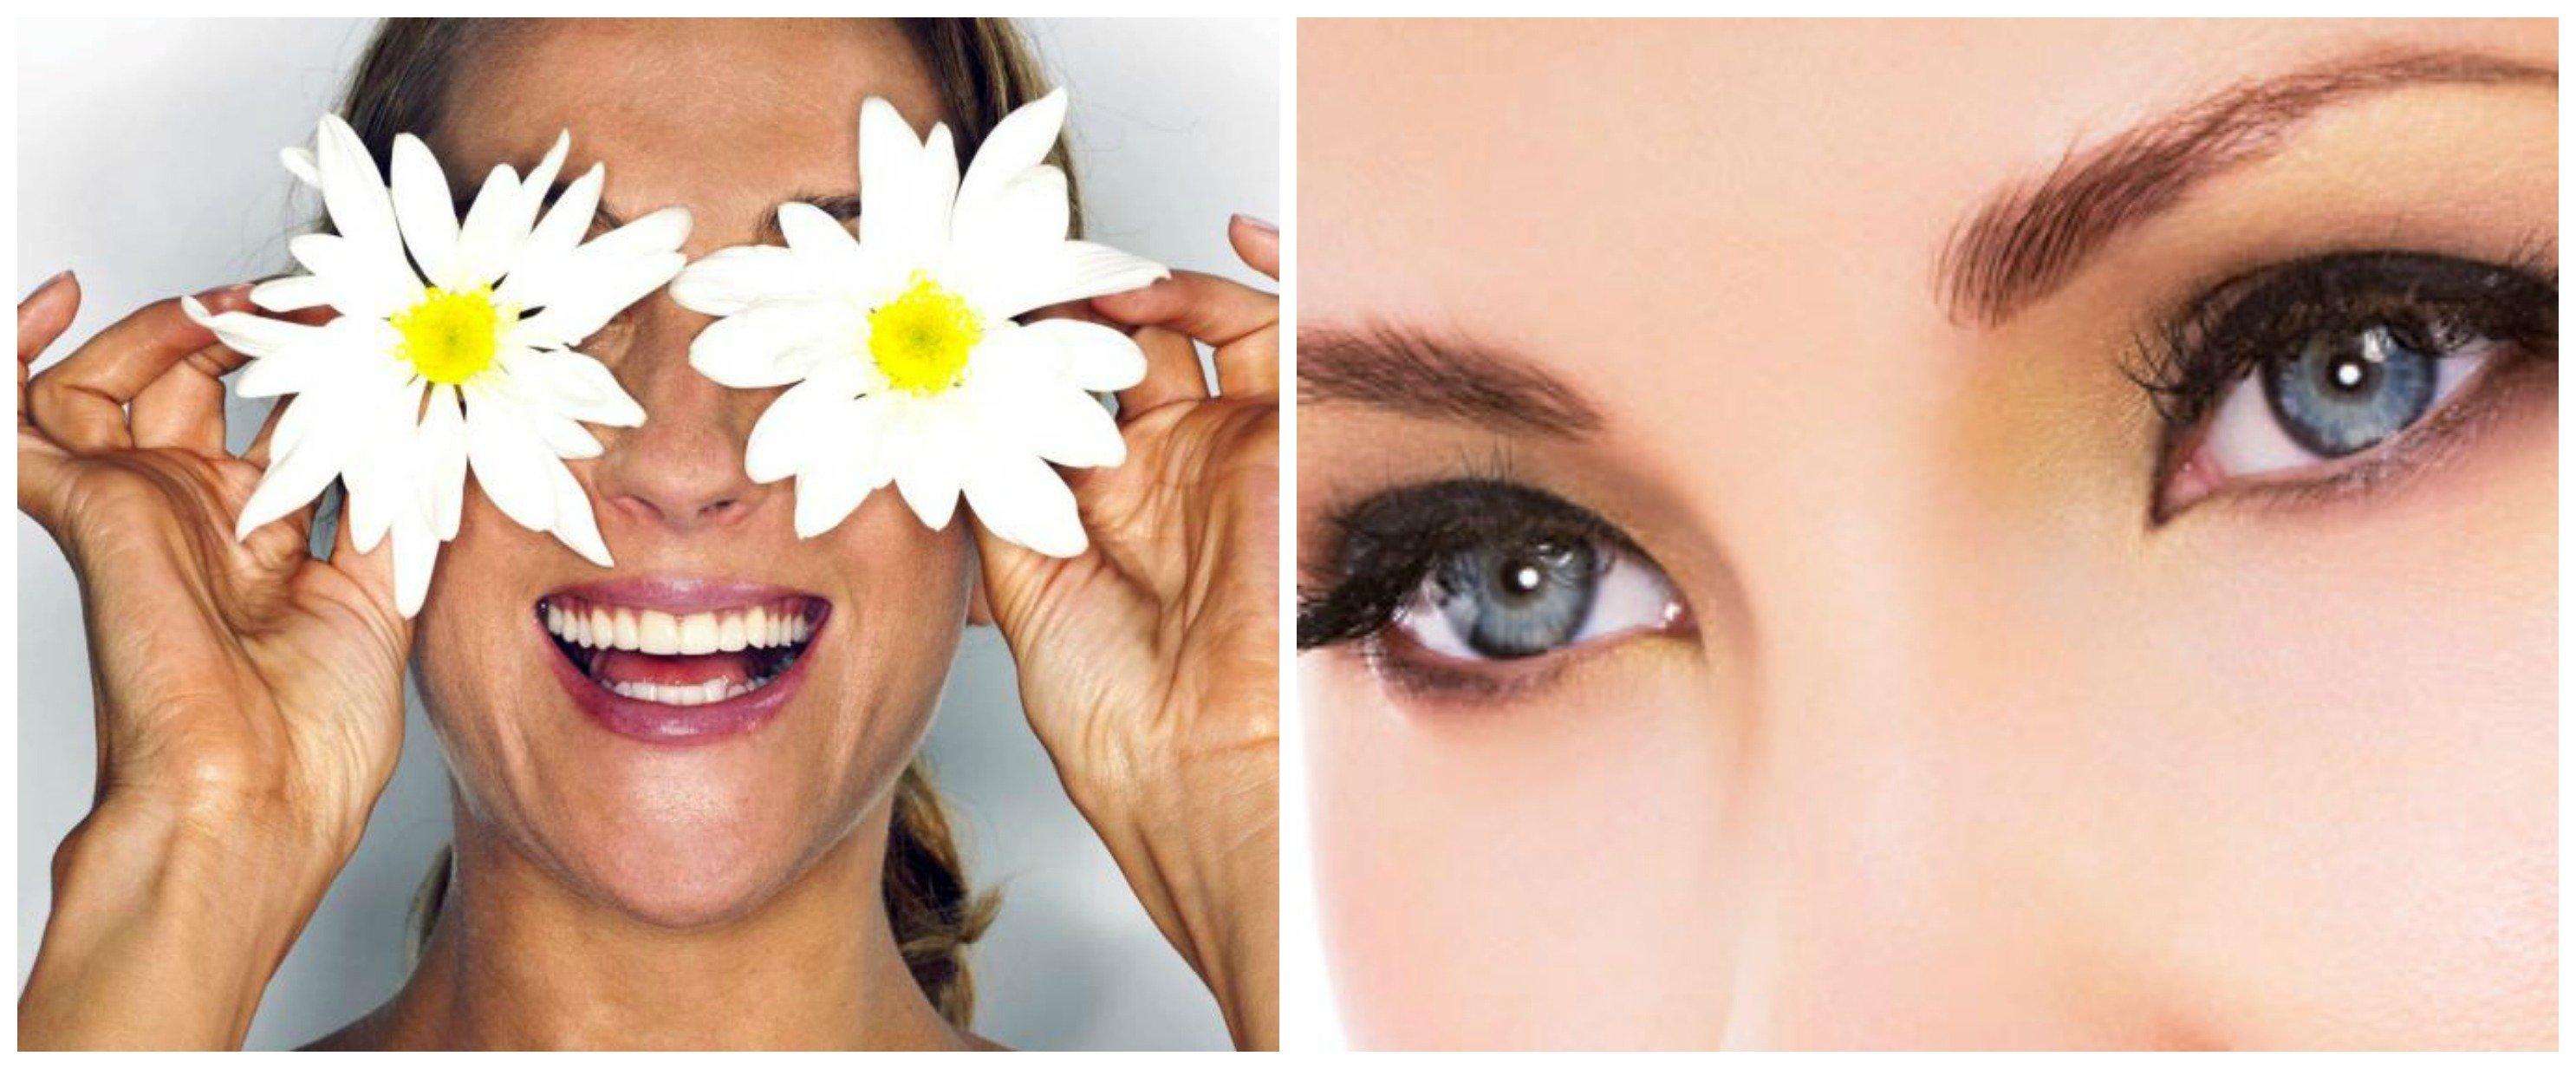 Цветок глаз